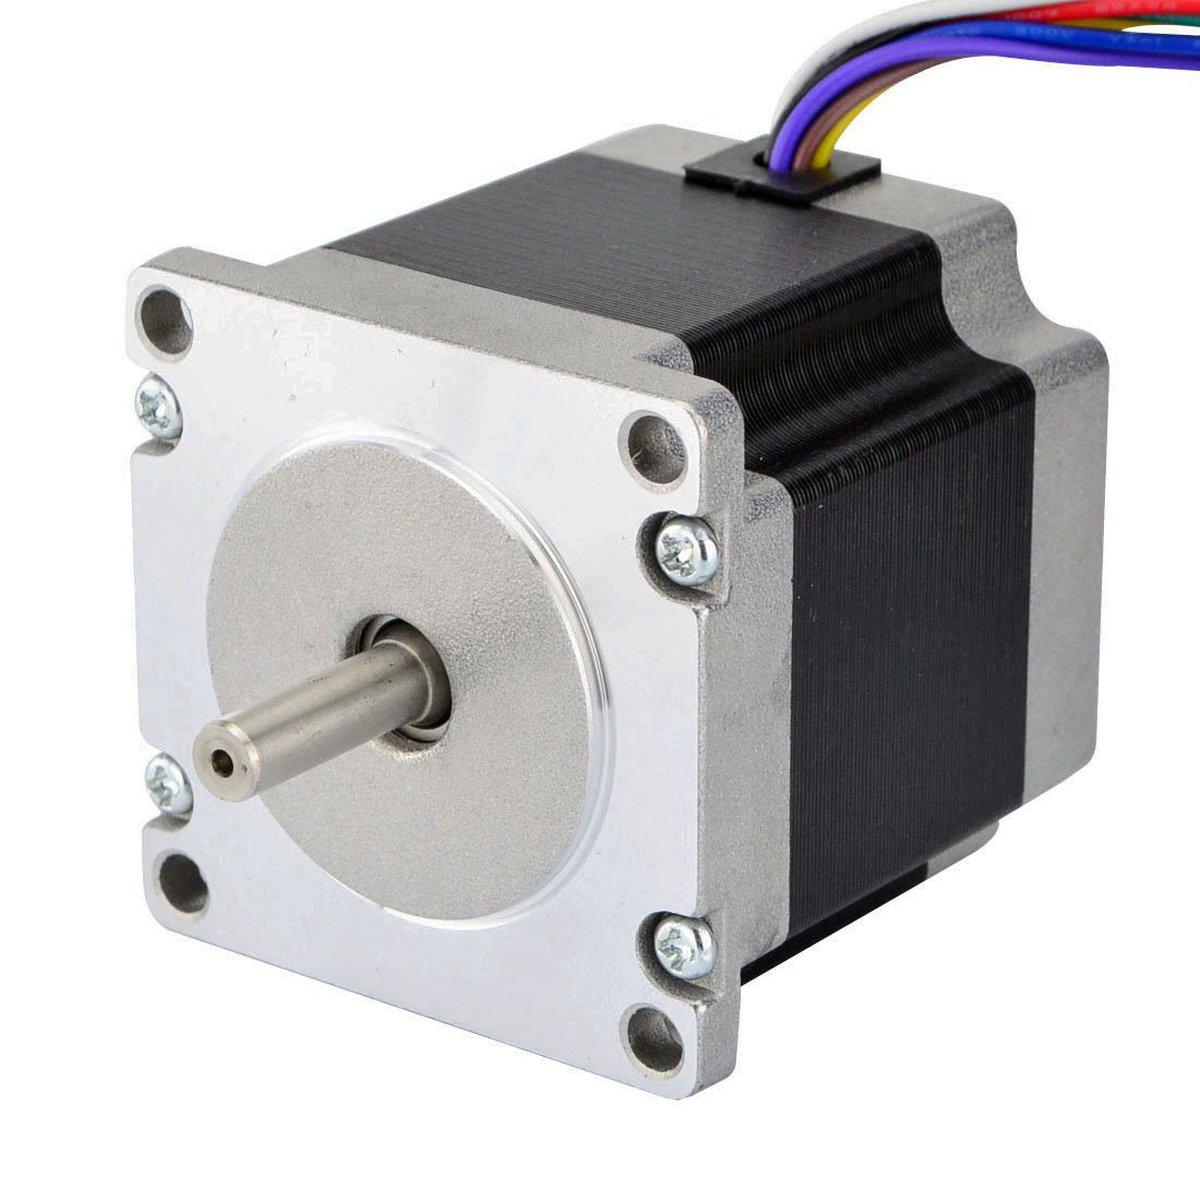 CNC NEMA 23 Metal Mounting Bracket for Nema 23 motors or Size 57 Motors//US ship